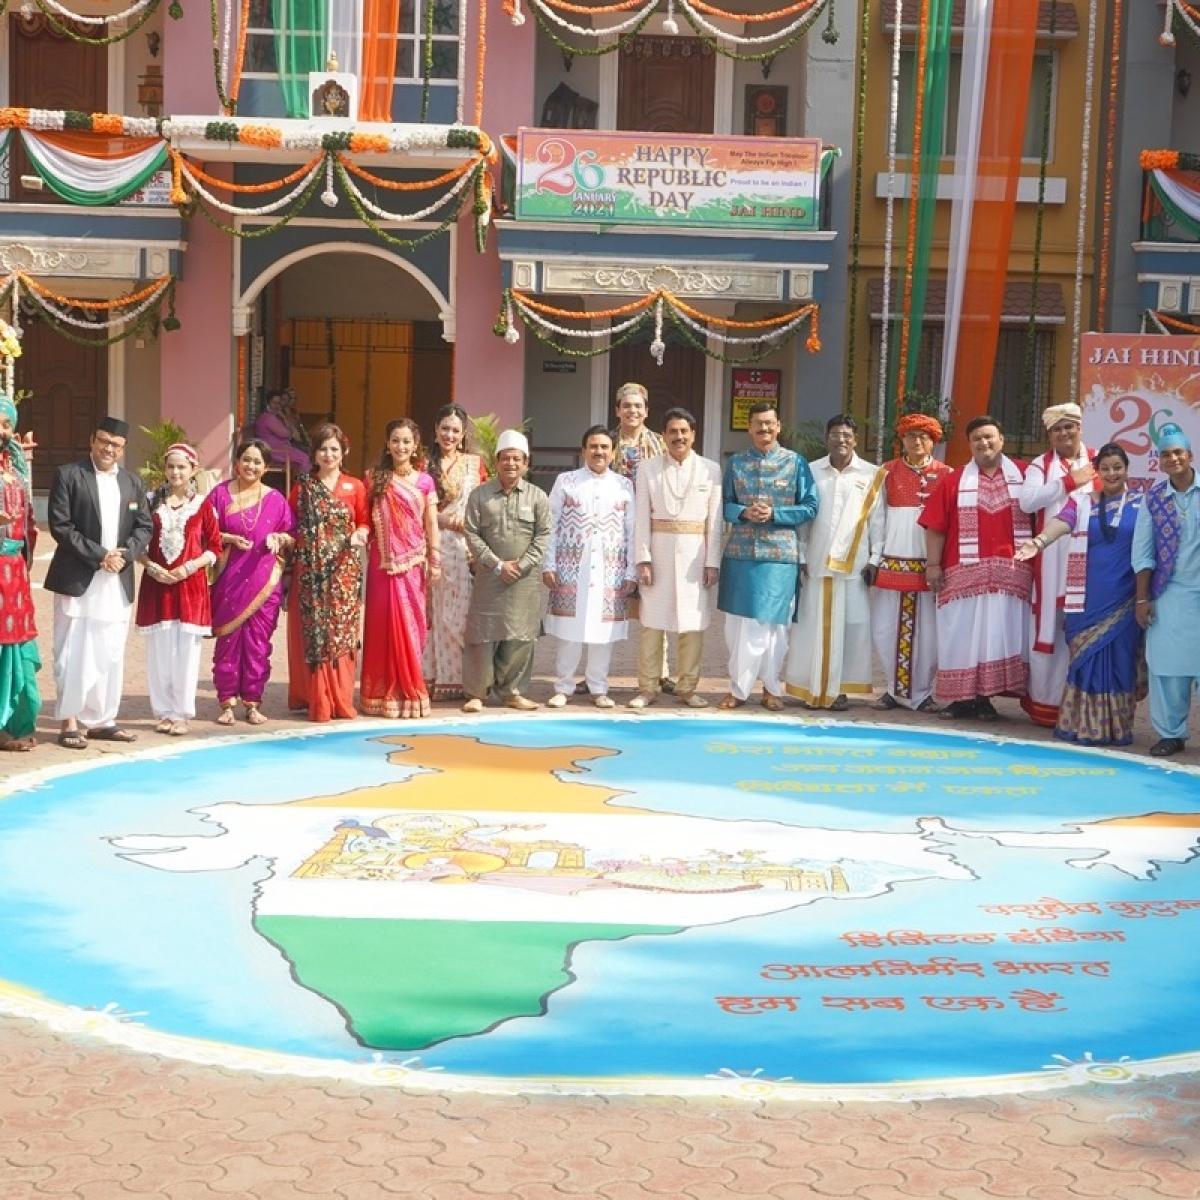 TMKOC: Gokuldhaam Society rekindles the spirit of India's Republic Day